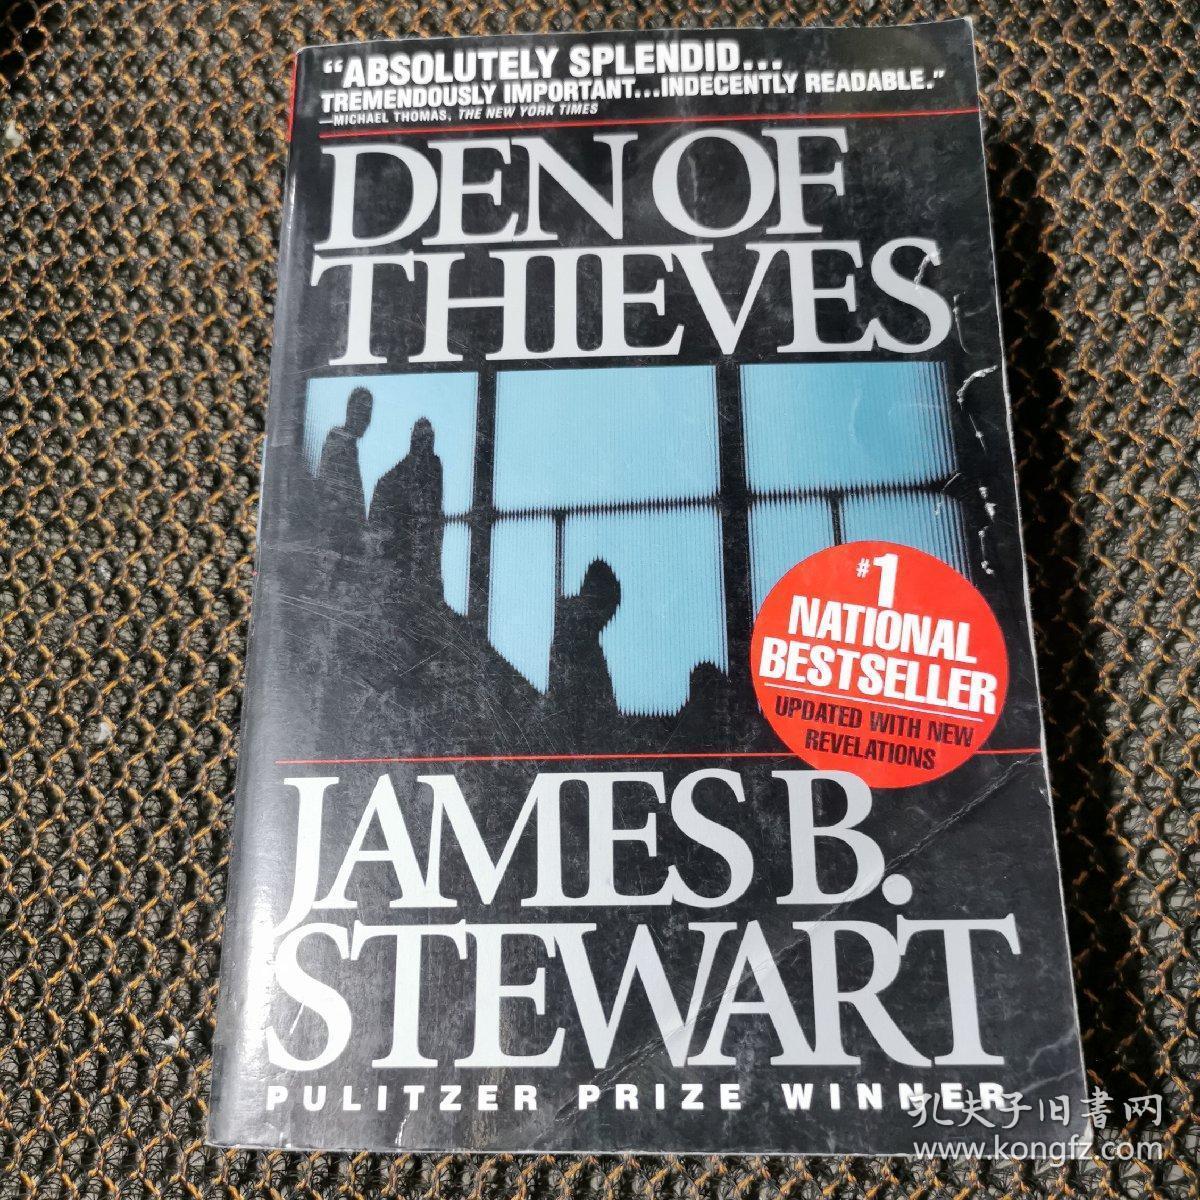 Den of Thieves /James Oversea